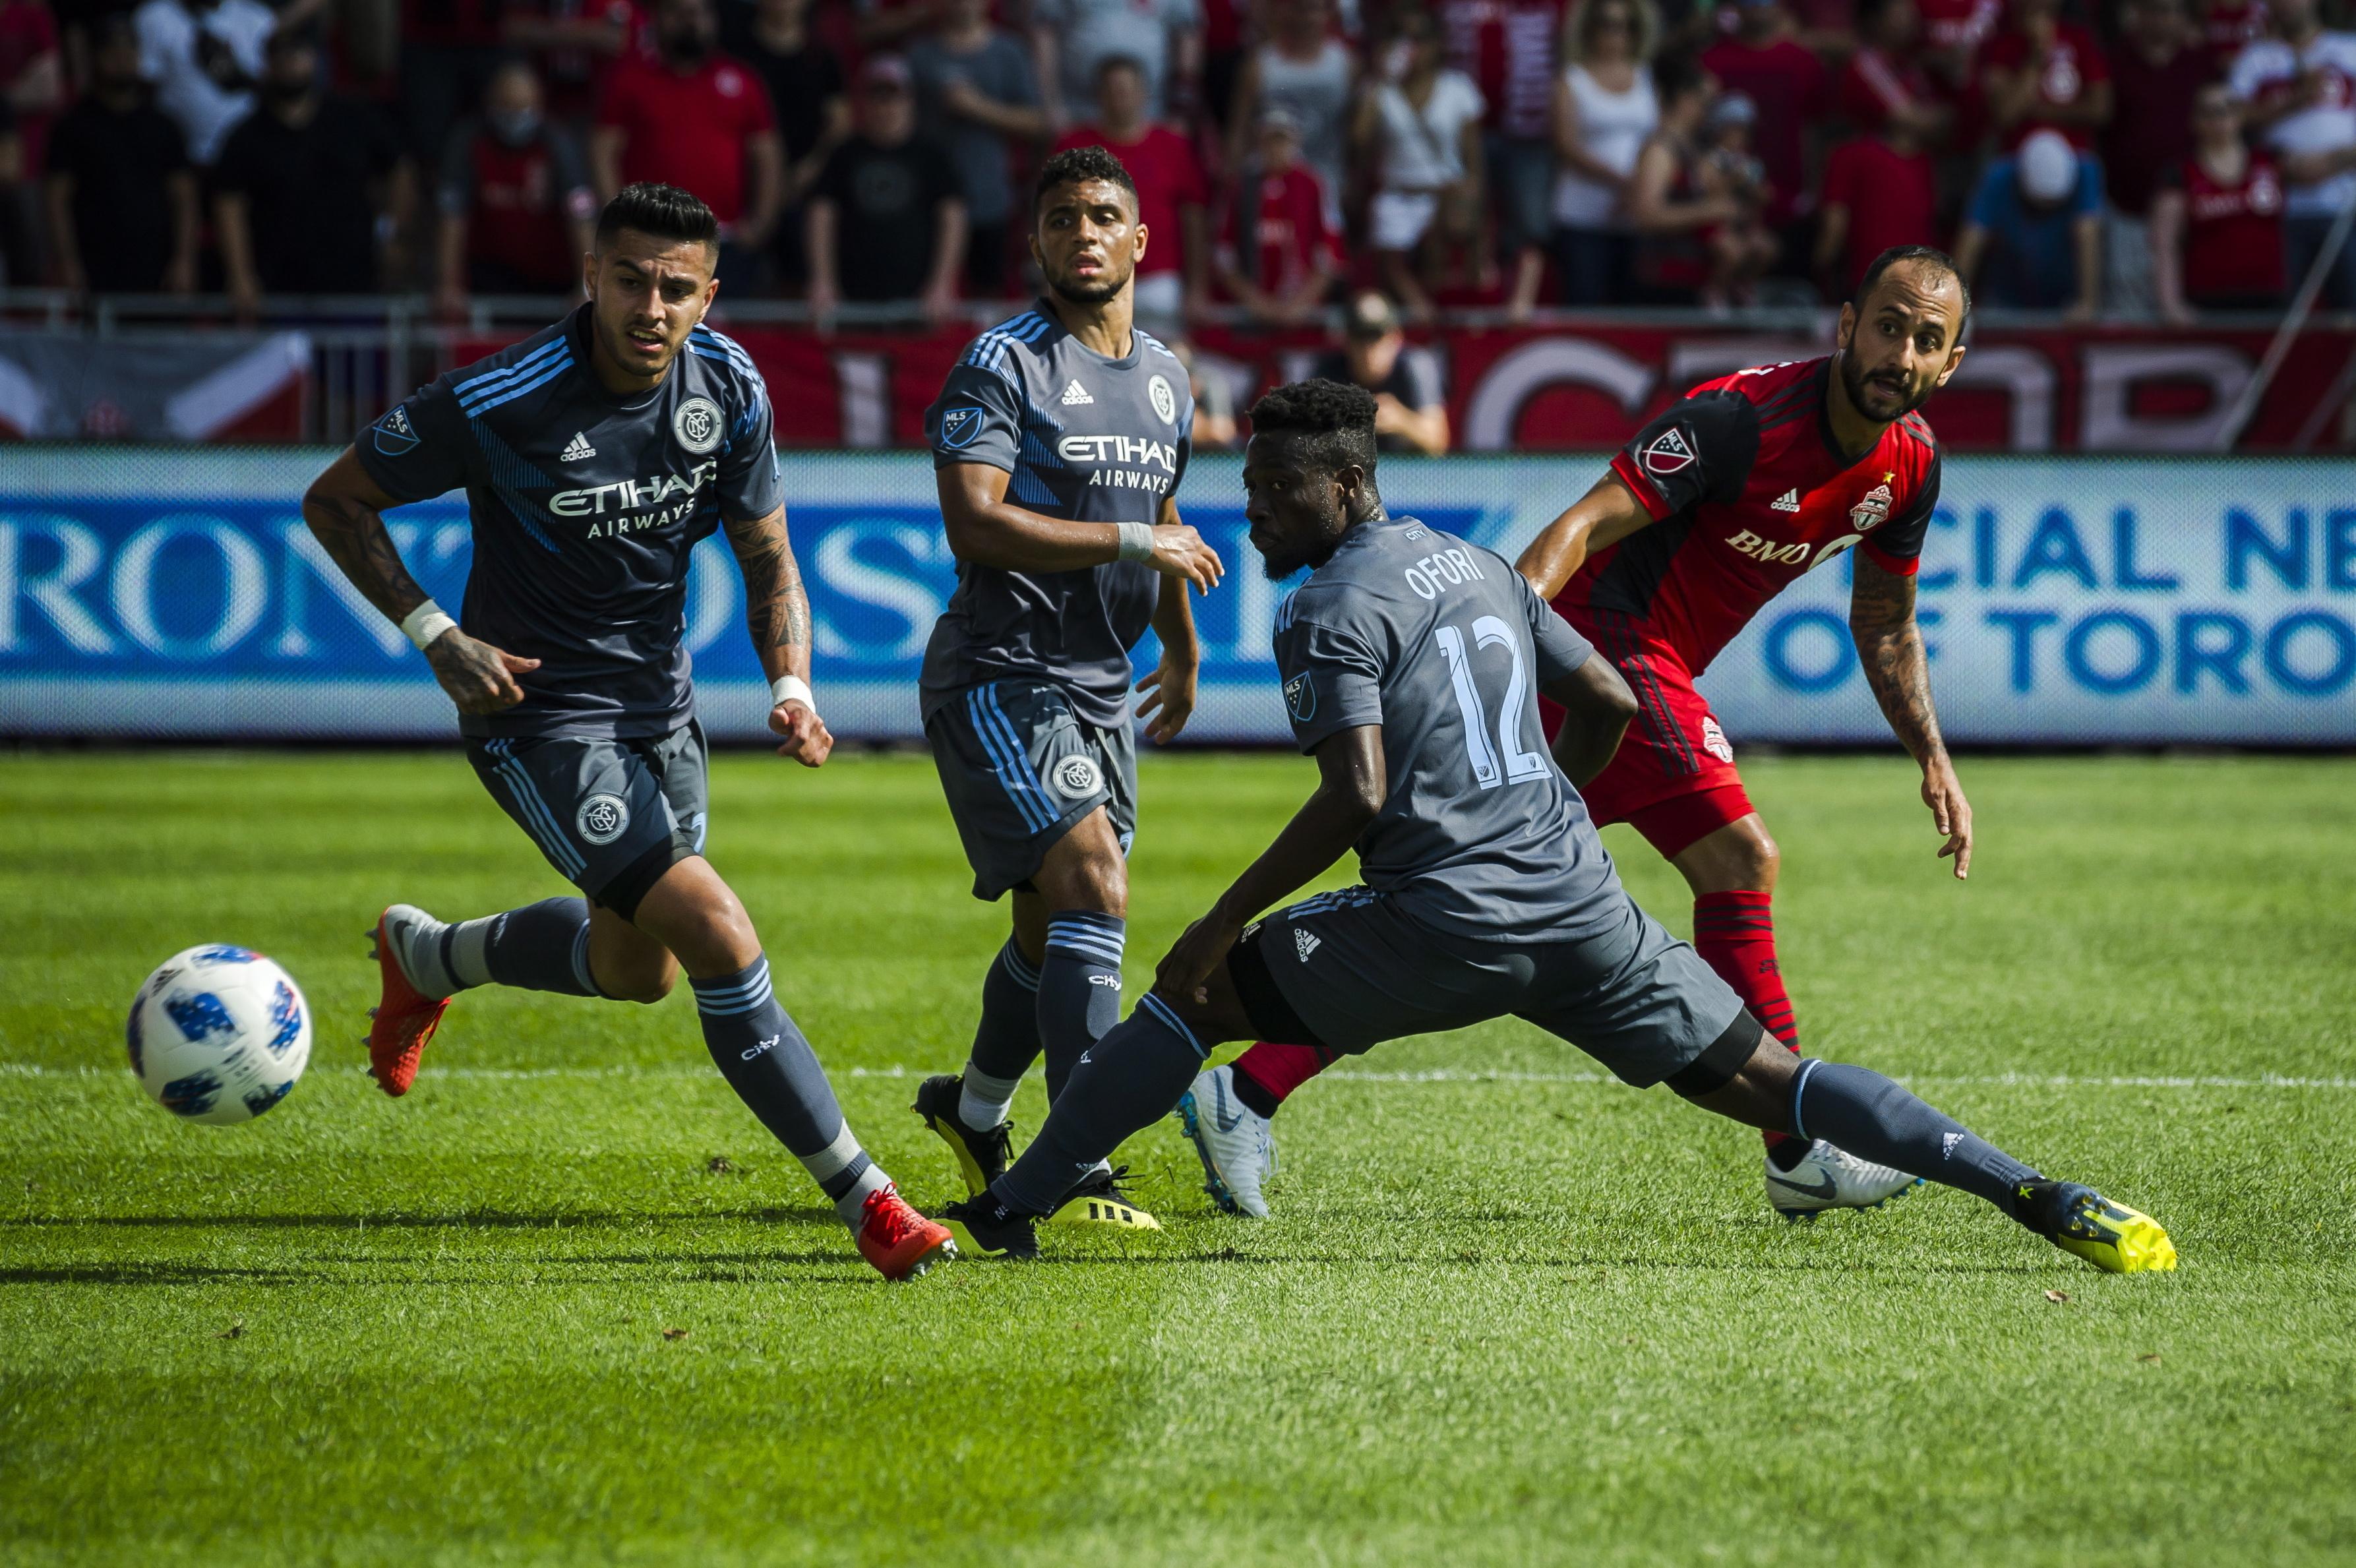 Tajouri-Shradi scores 2 goals, NYC FC beats Toronto 3-2